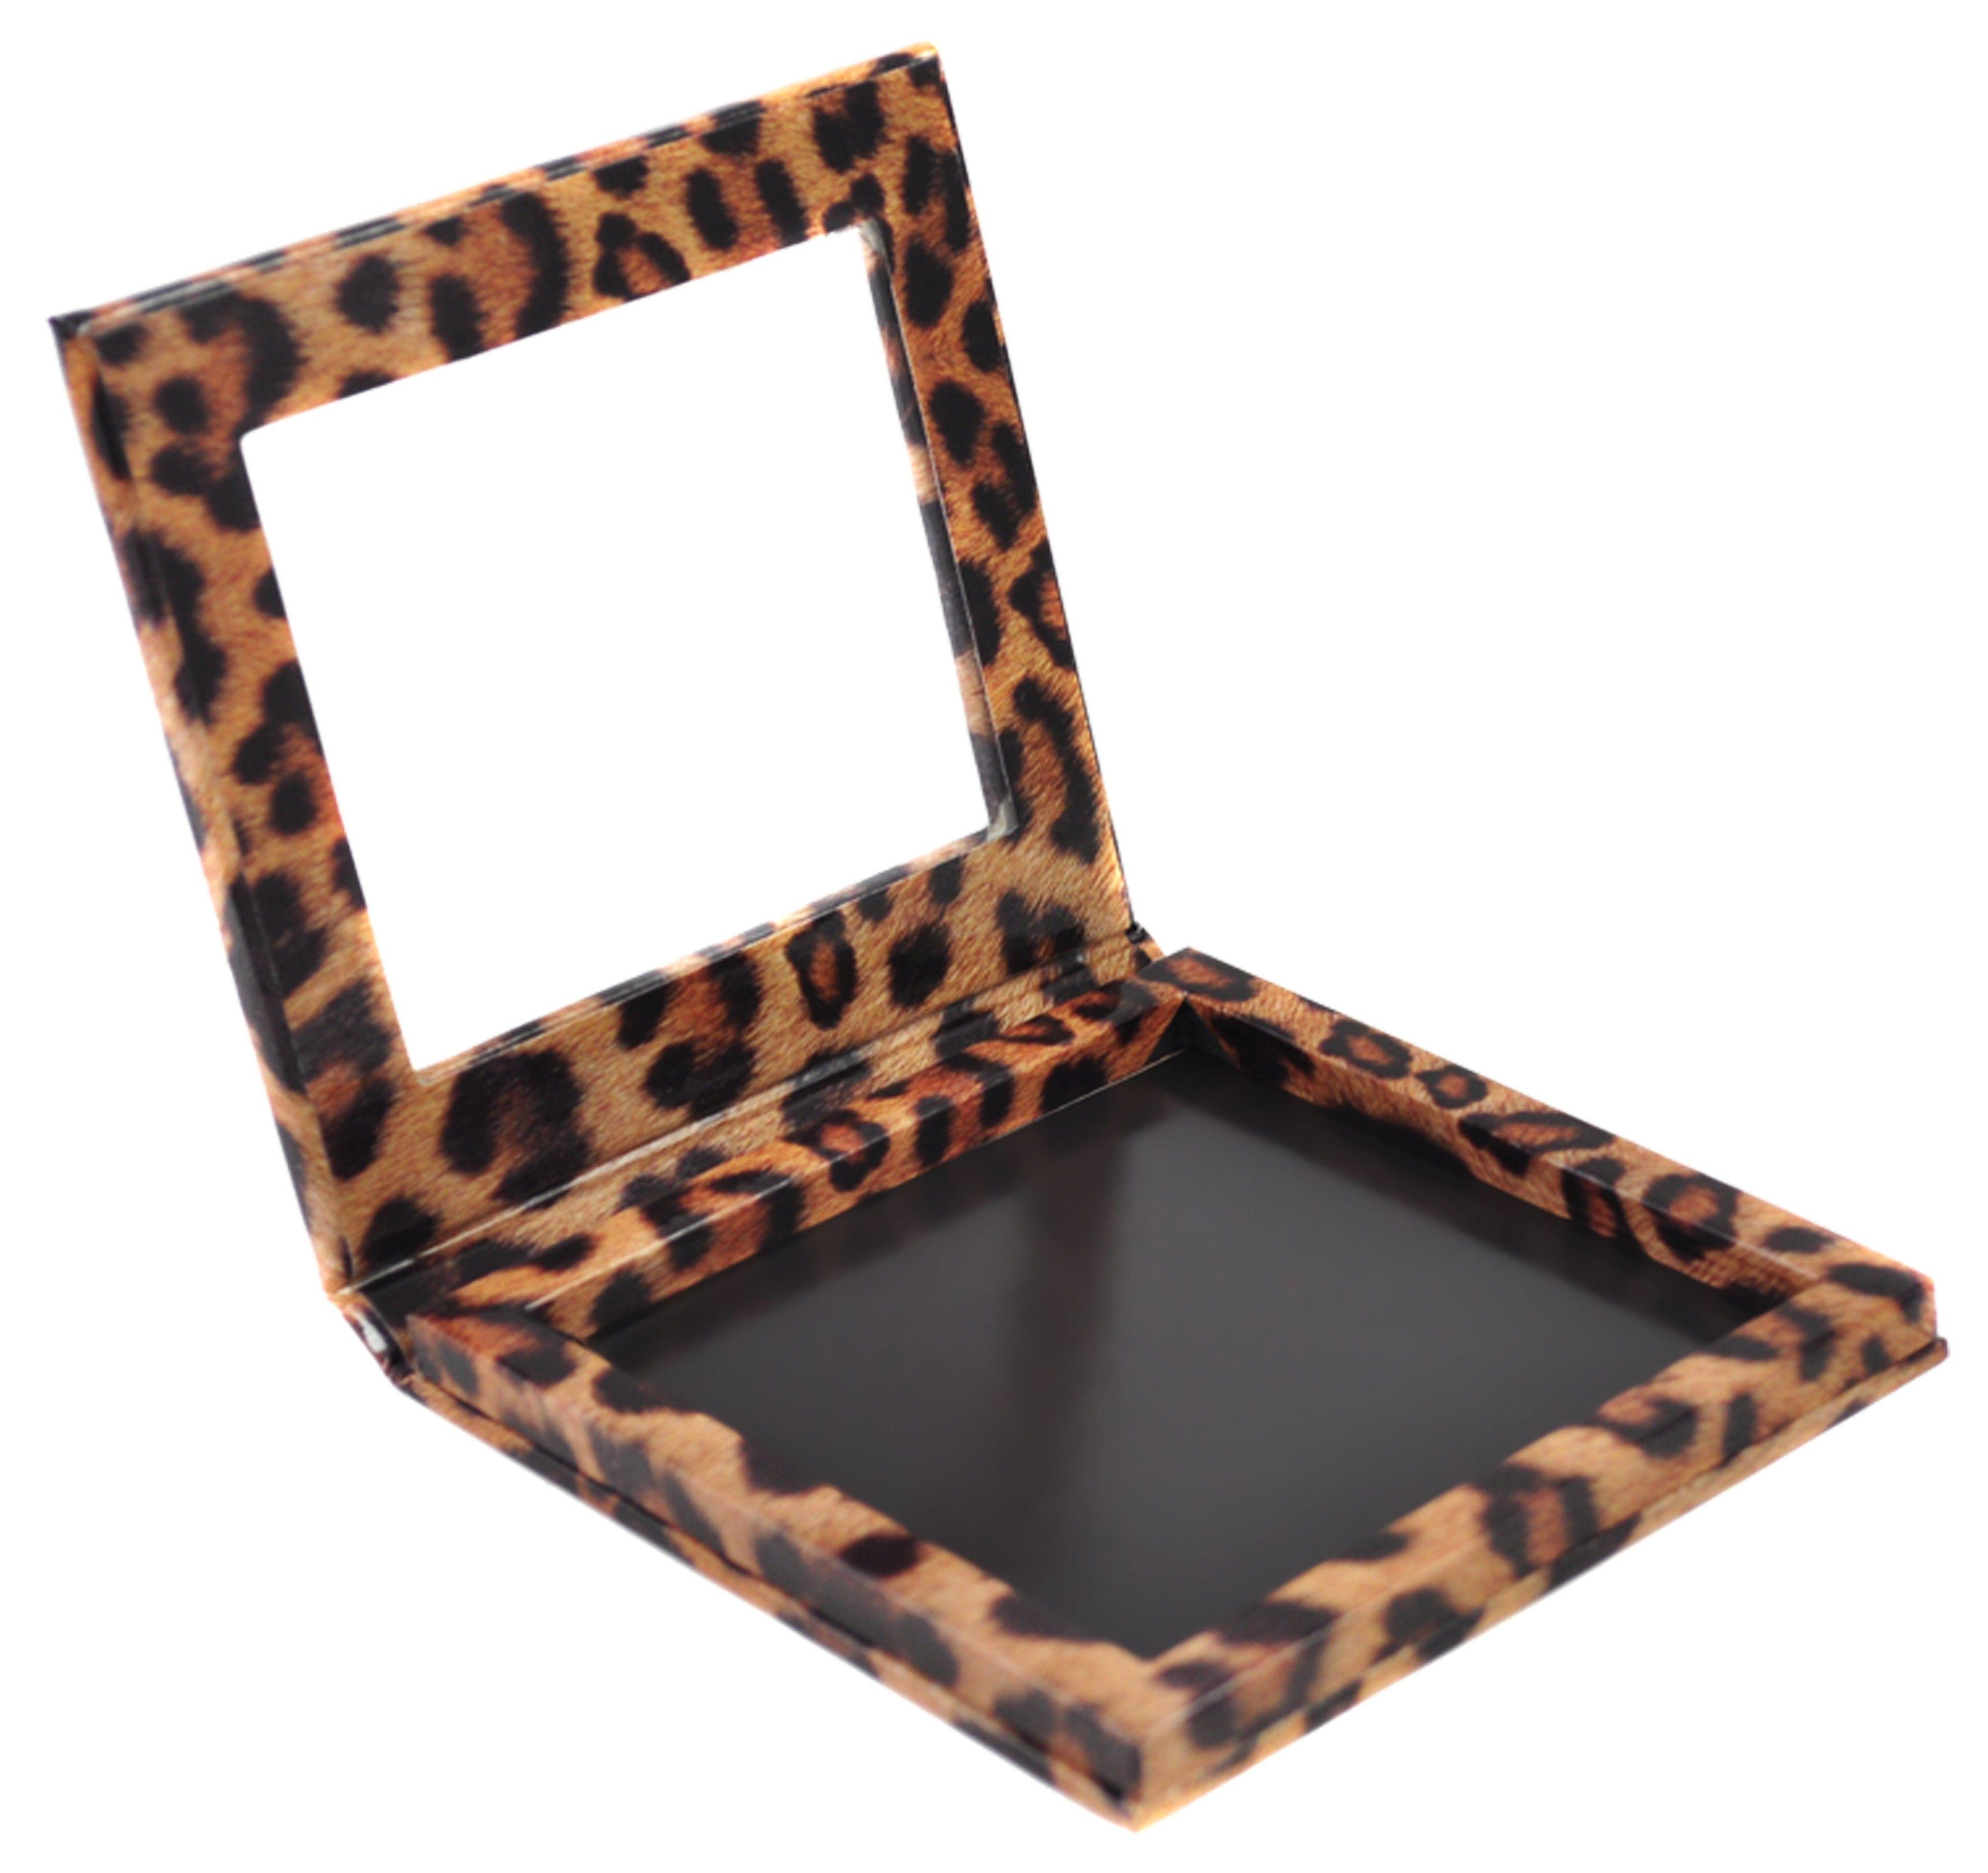 Z Palette Small Leopard Empty Palettes Palettes Z